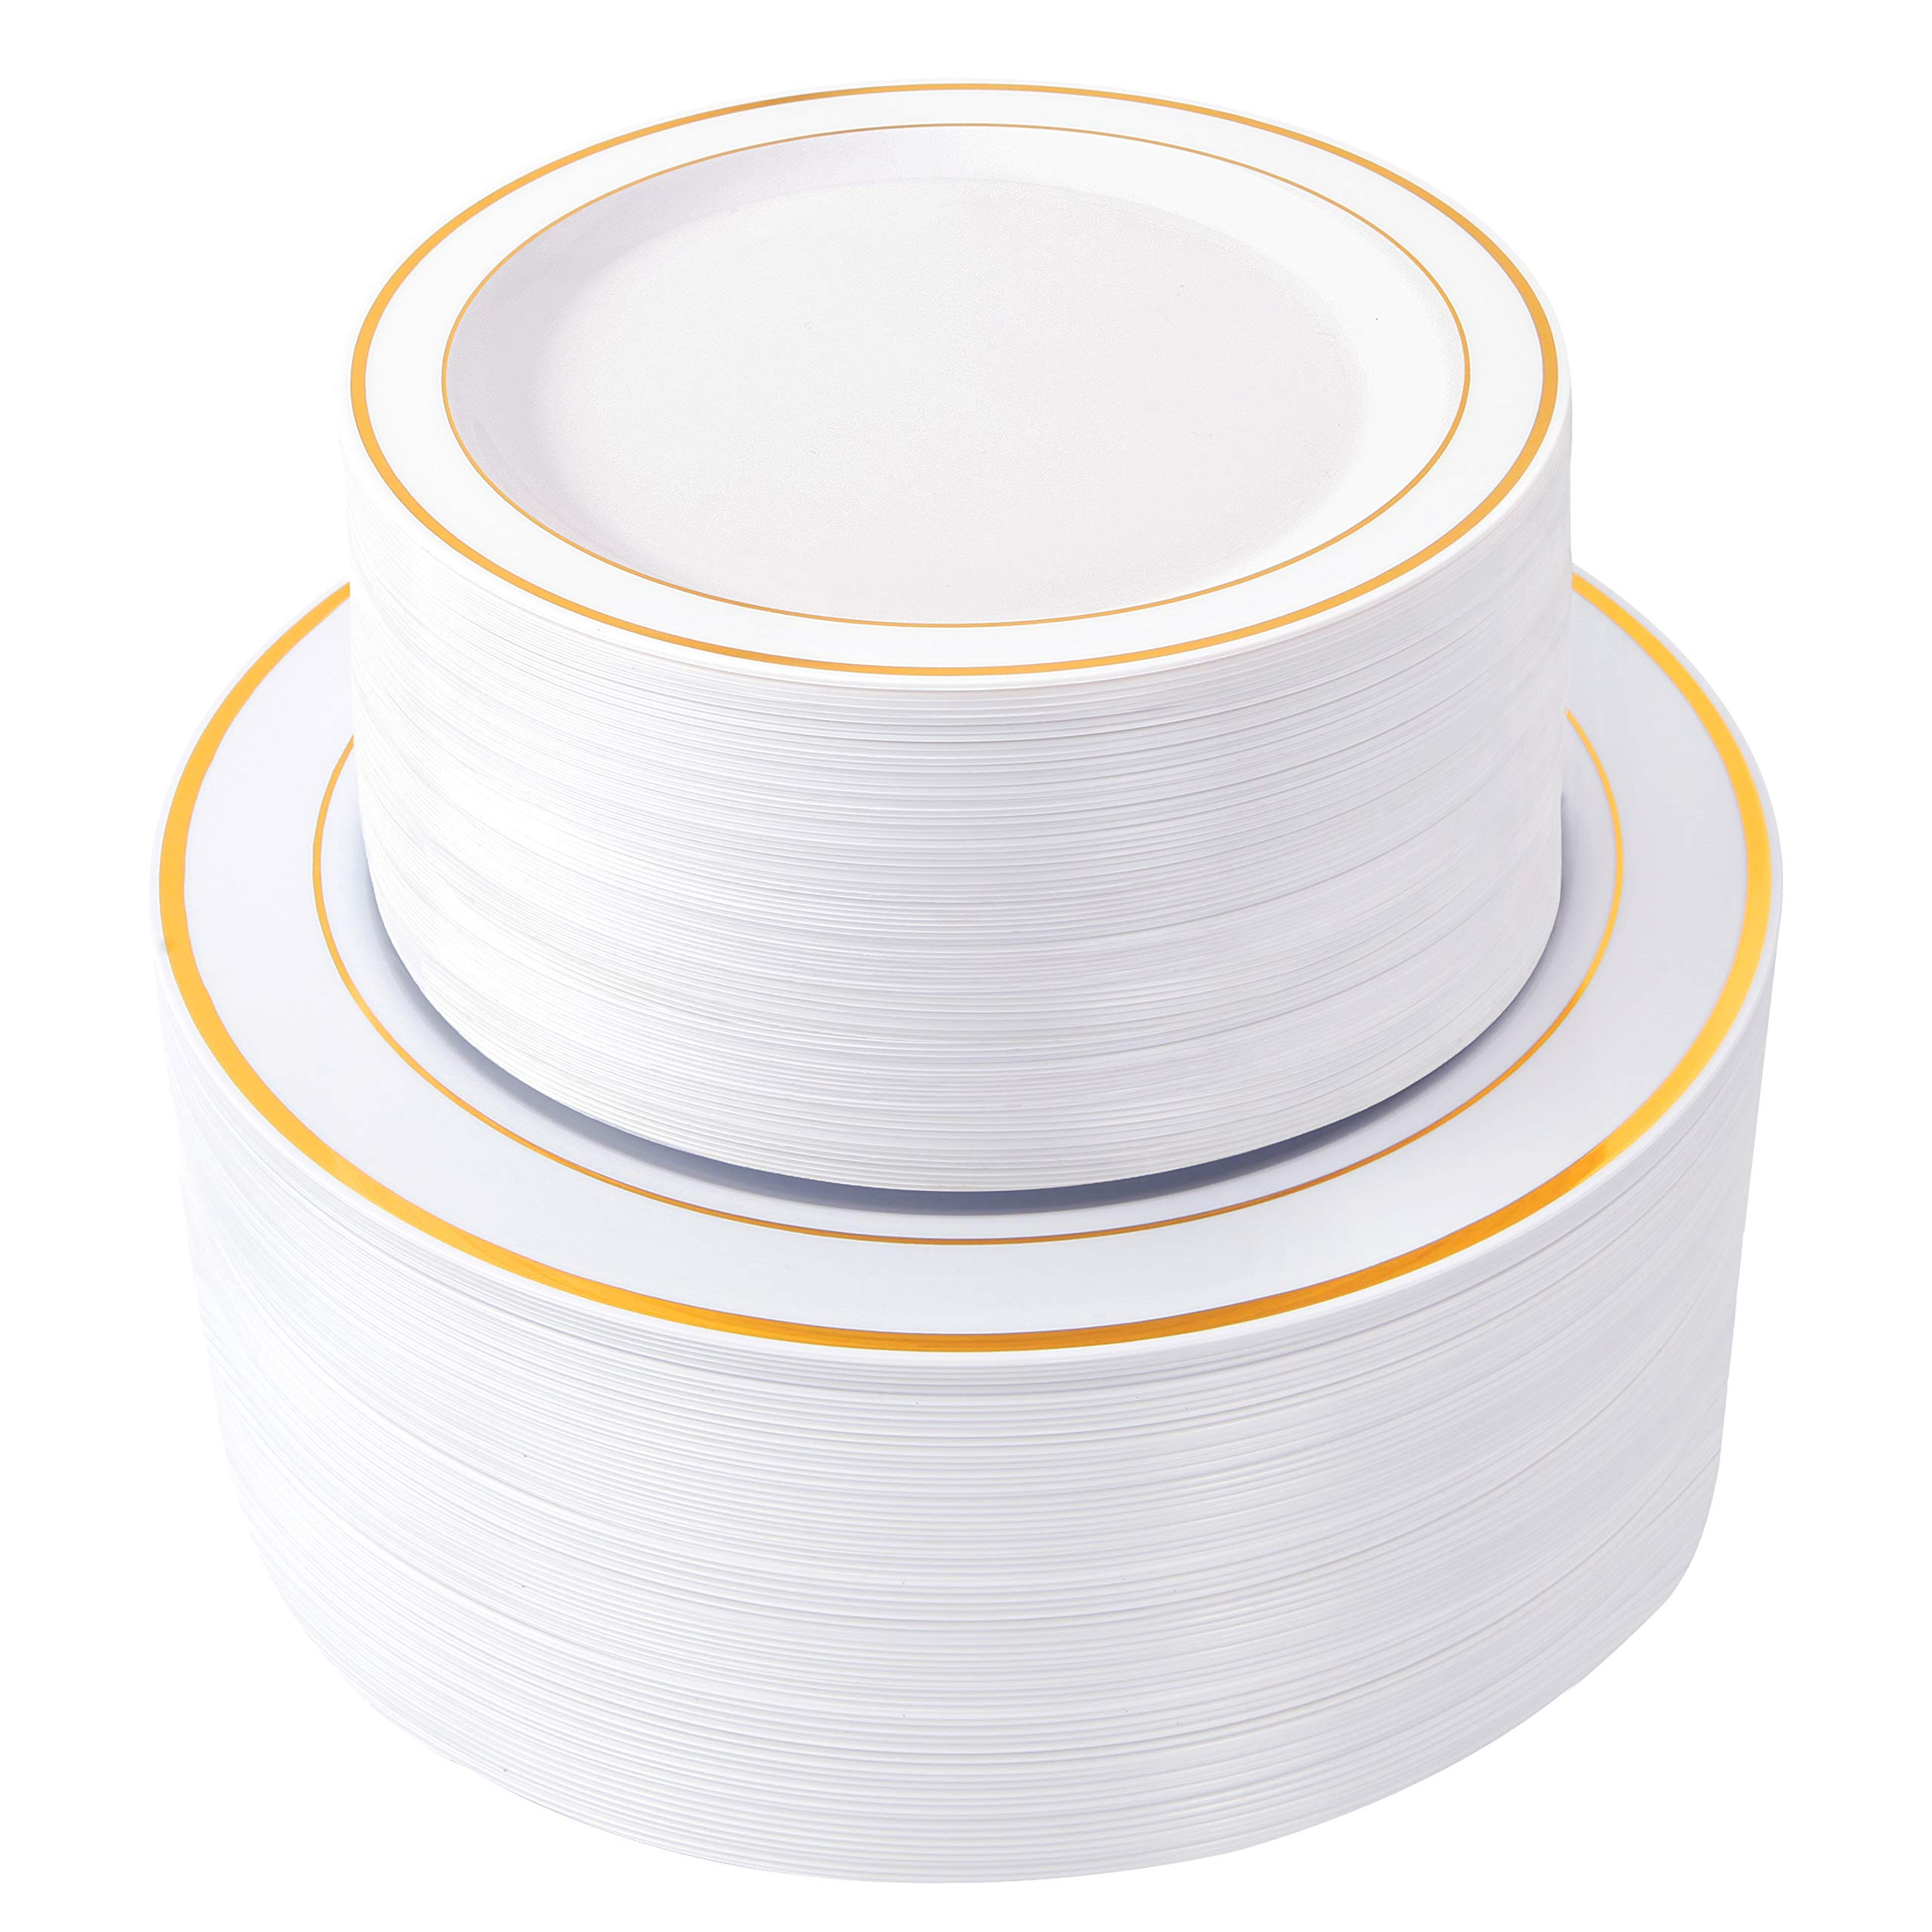 WDF 120 pieces Gold Disposable Plastic Plates- Gold Rim Wedding Party Plates,Premium Heavy Duty 60-10.25'' Dinner Plates and 60-7.5'' Salad Plates Combo (Gold Plates) by WDF